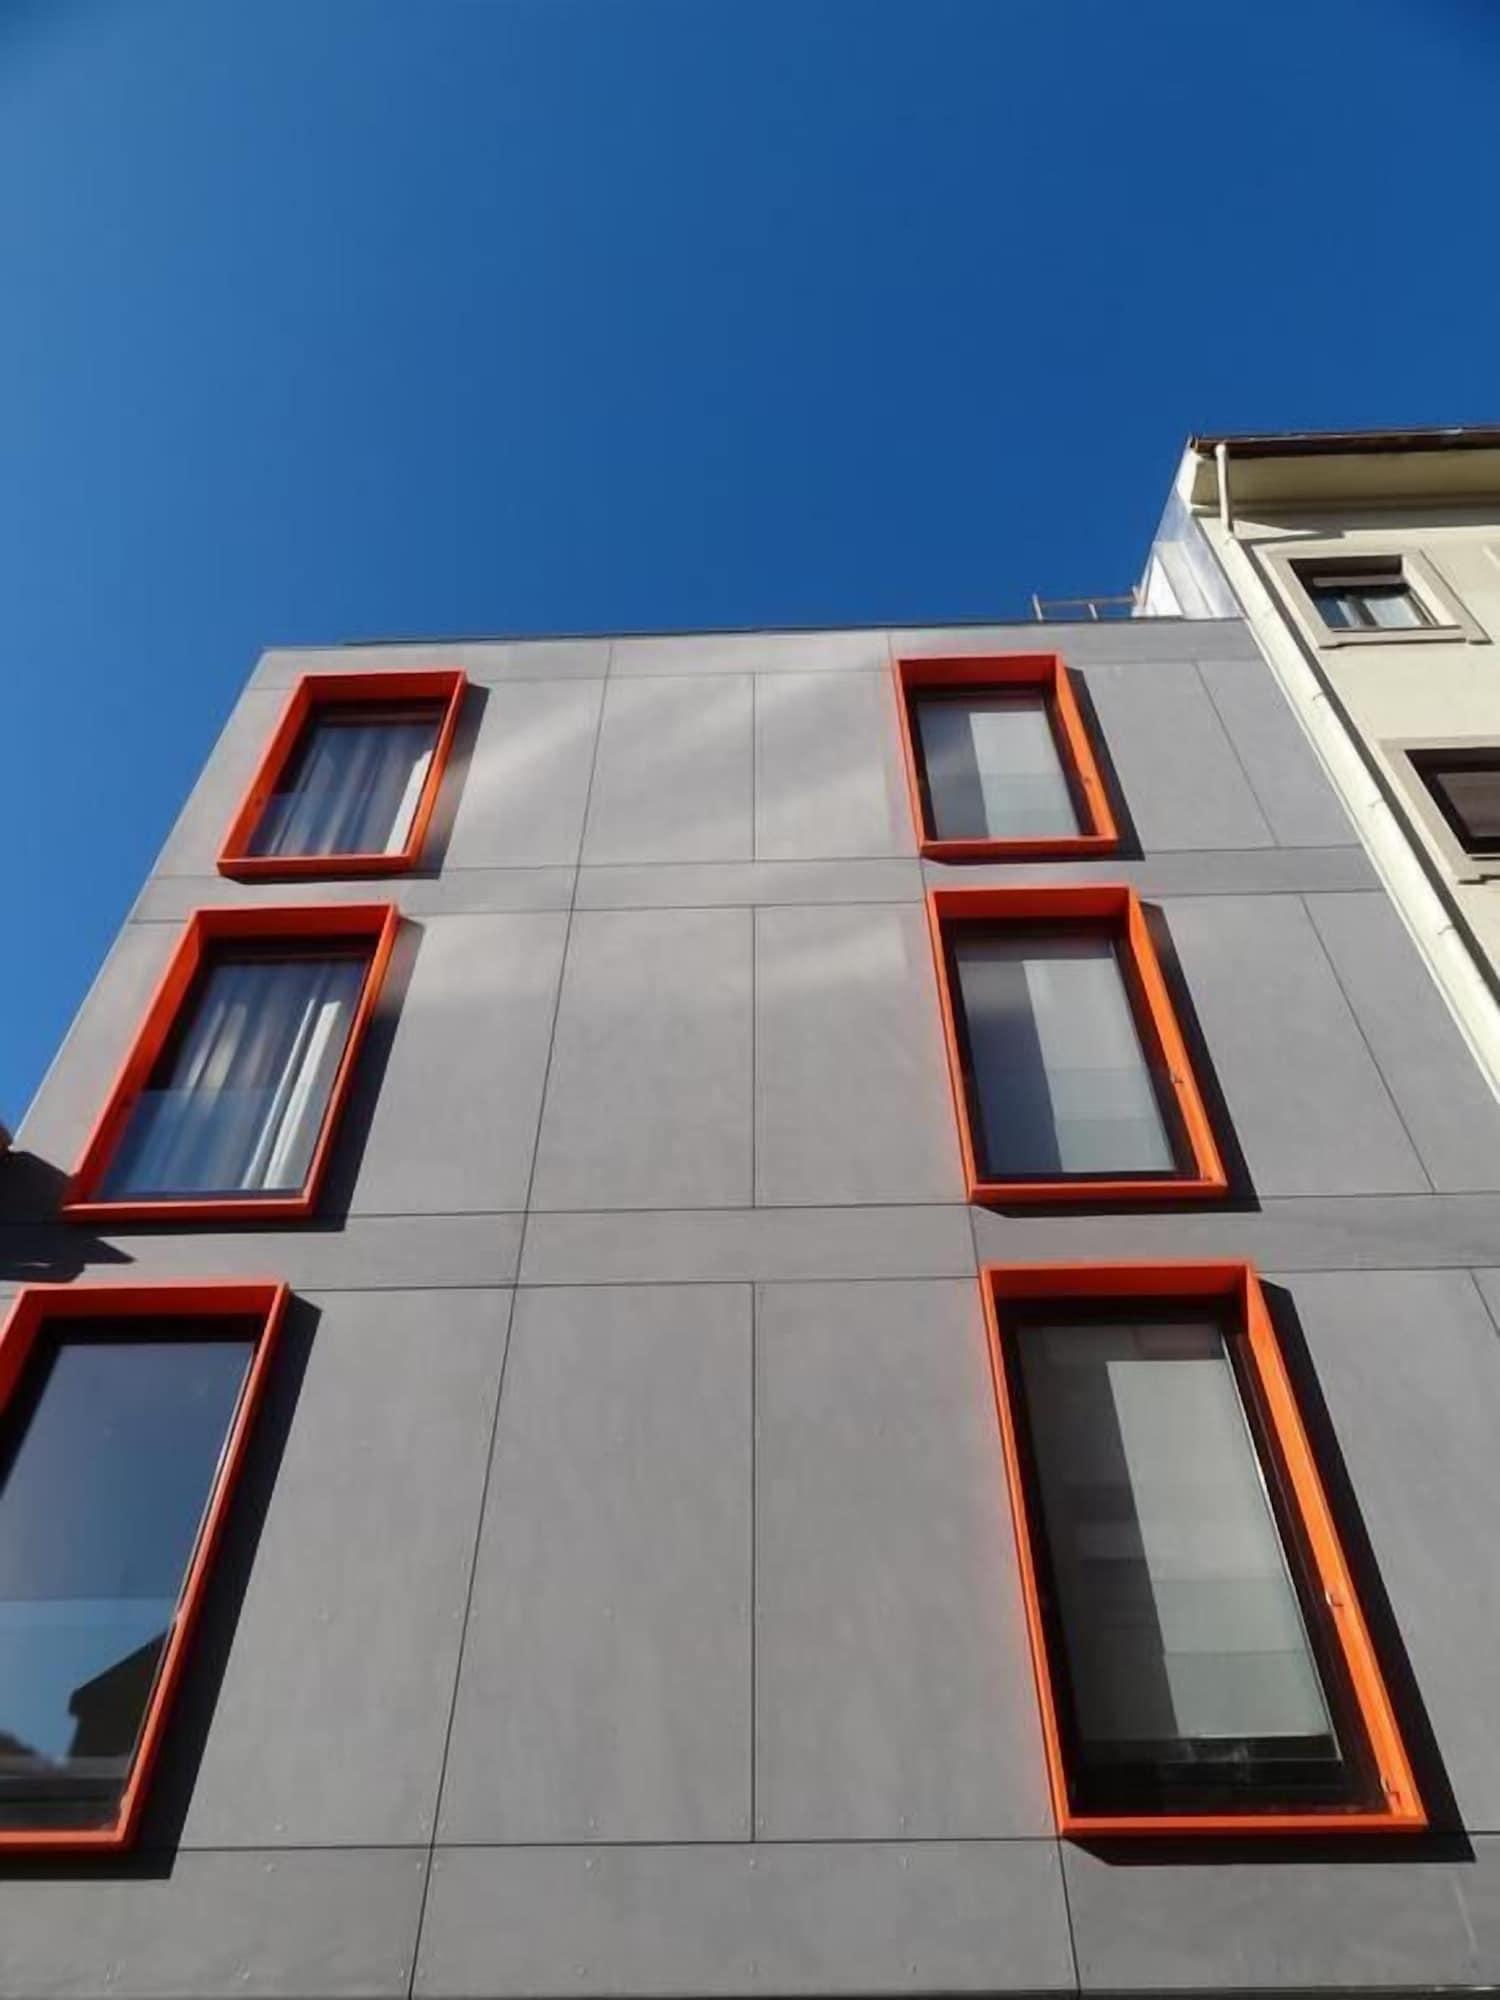 Innapartments Trindade, Porto